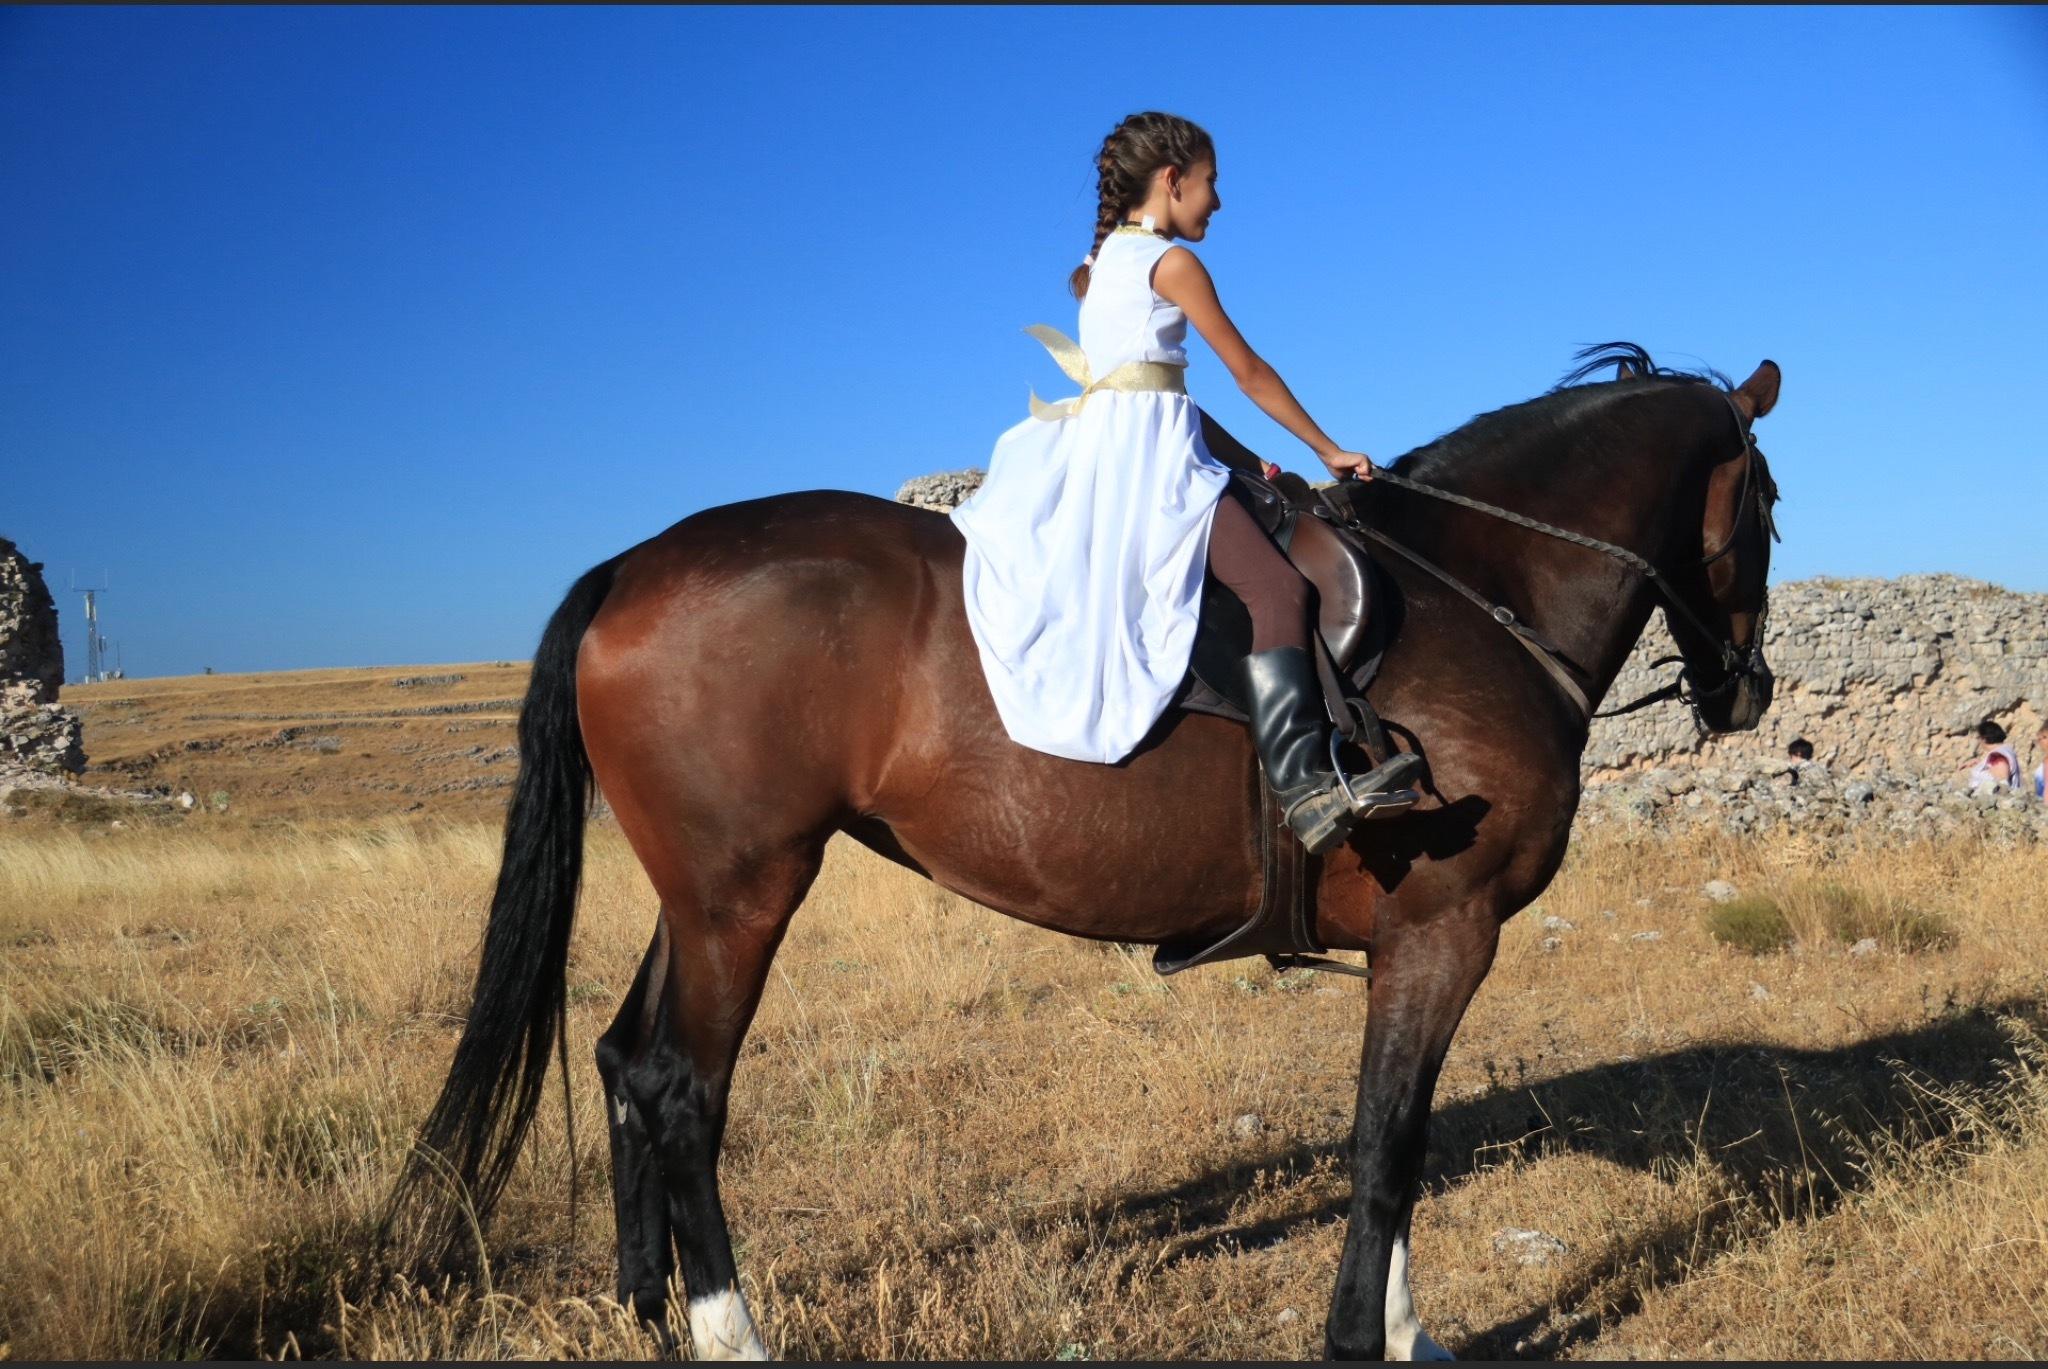 Beautiful horsewoman by Gregorio Emper